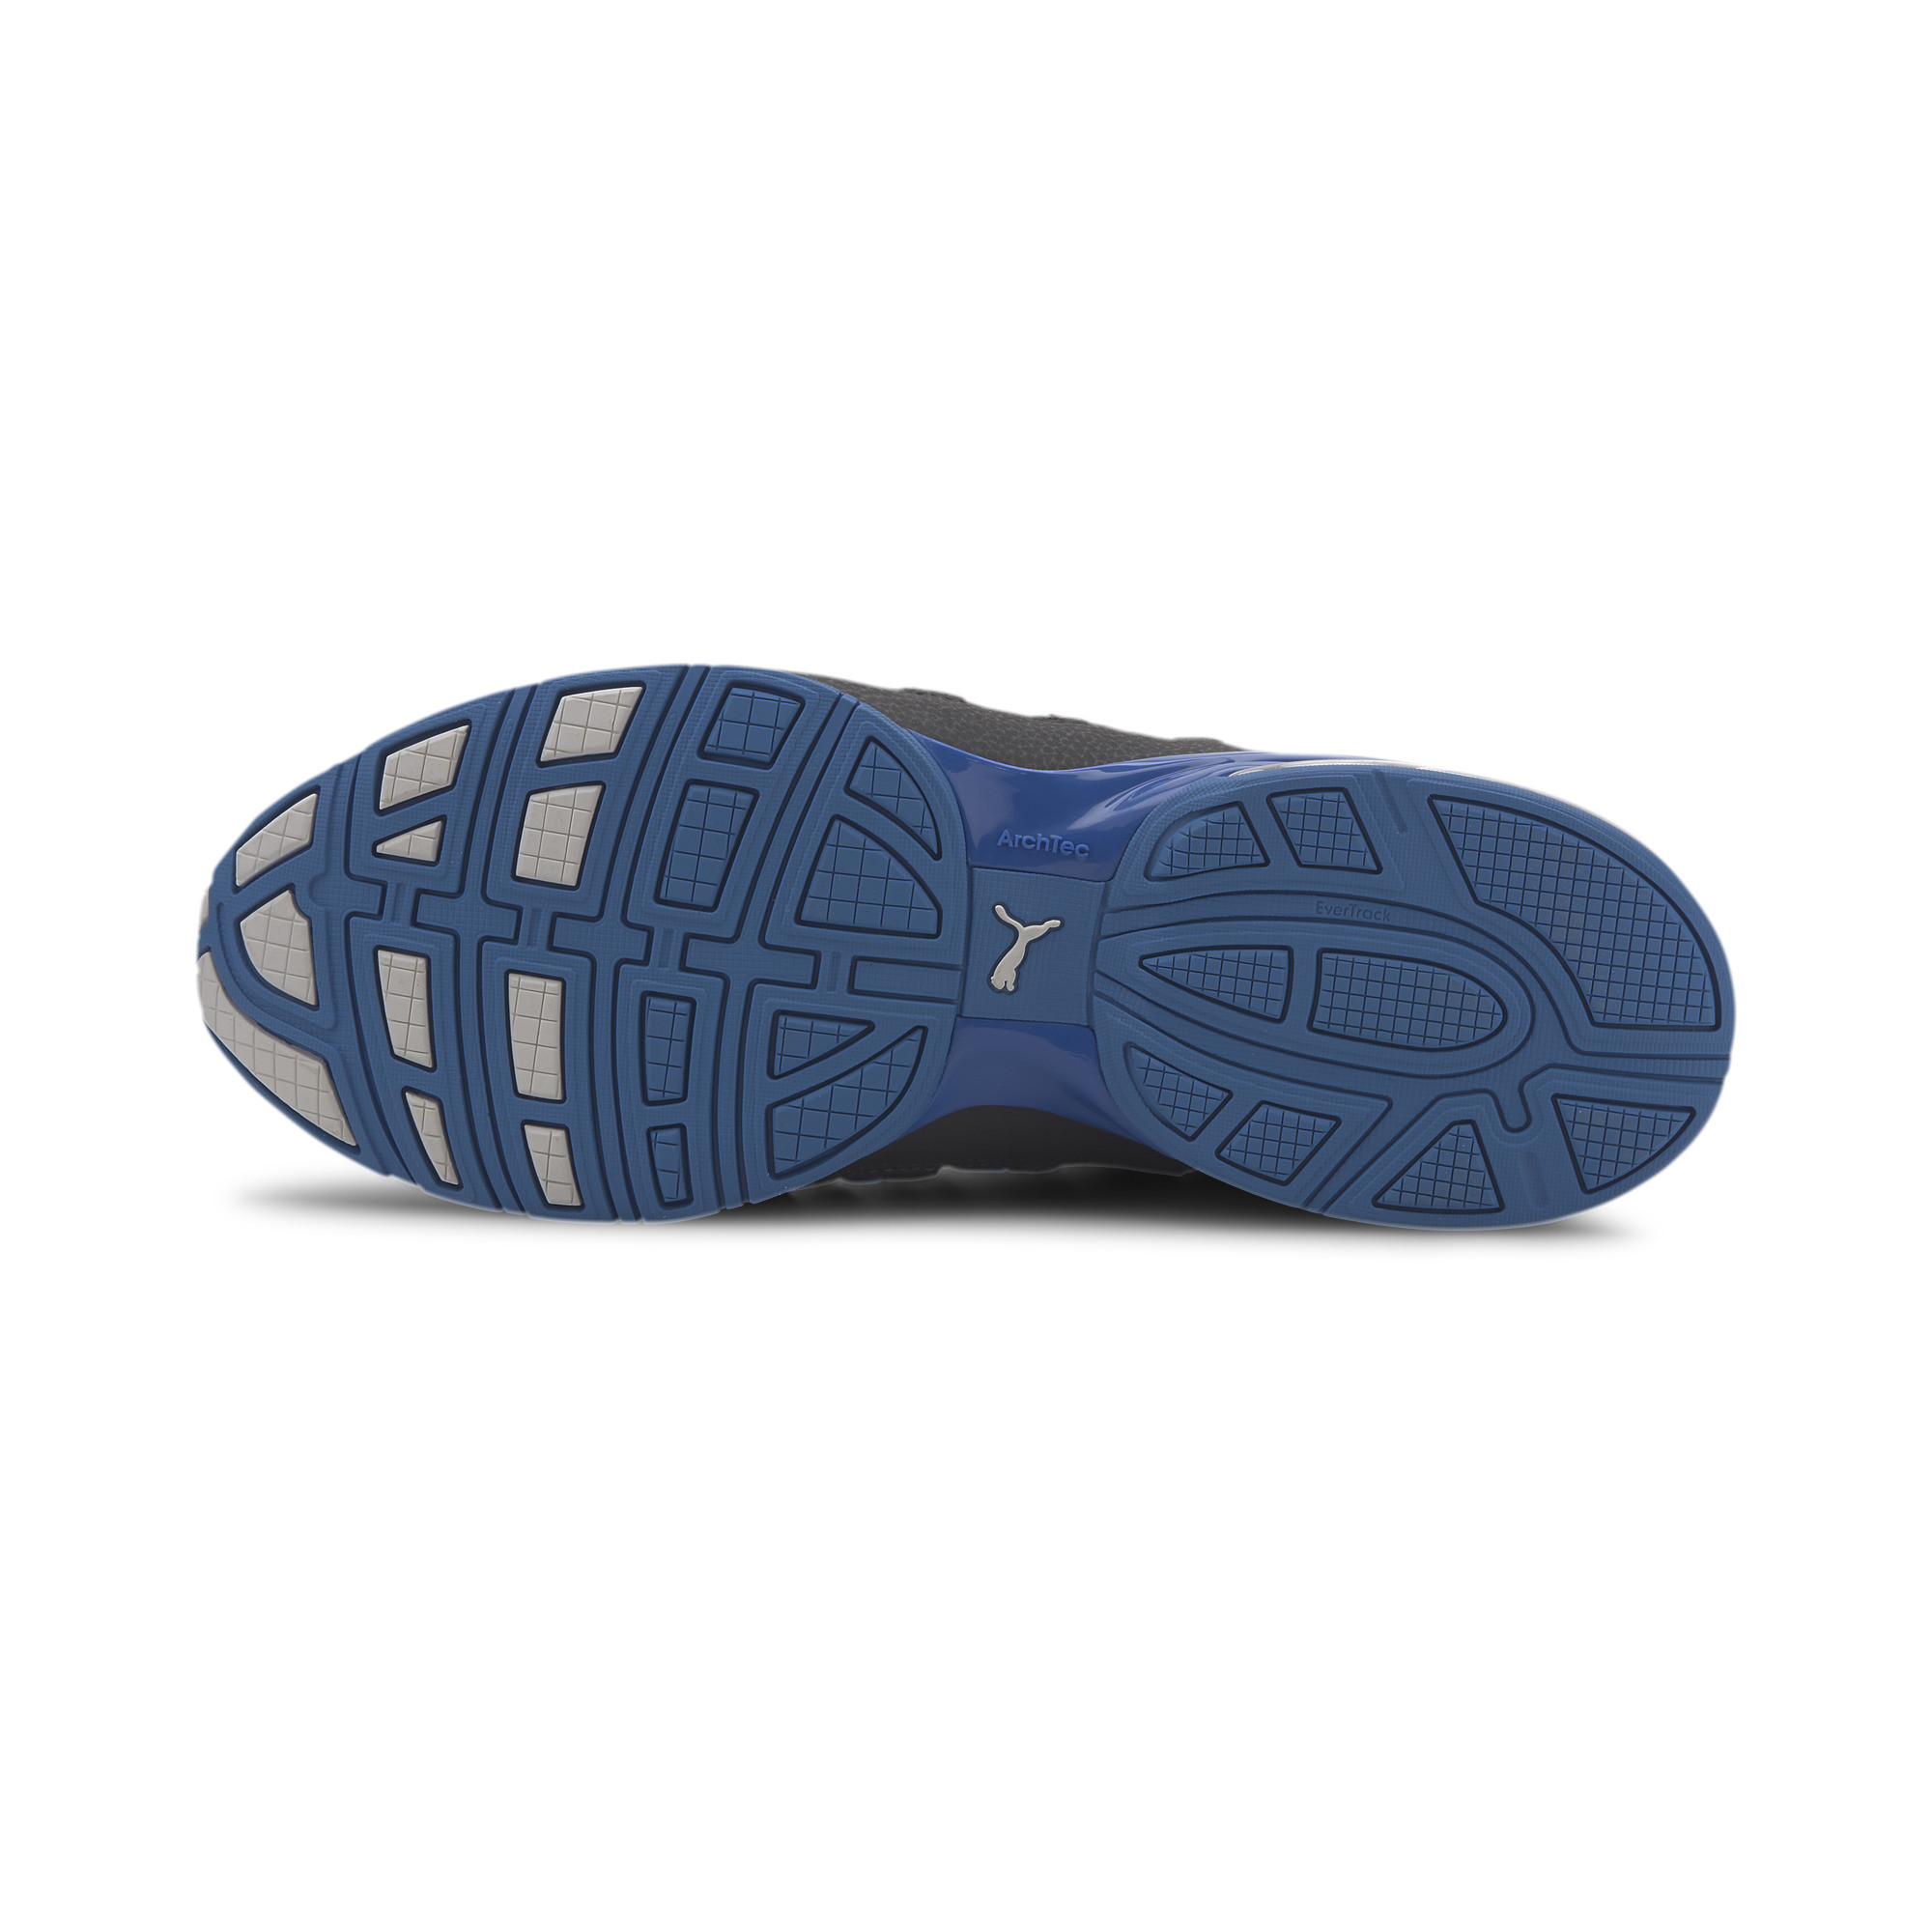 PUMA-Men-039-s-CELL-Regulate-Bold-Training-Shoes thumbnail 13